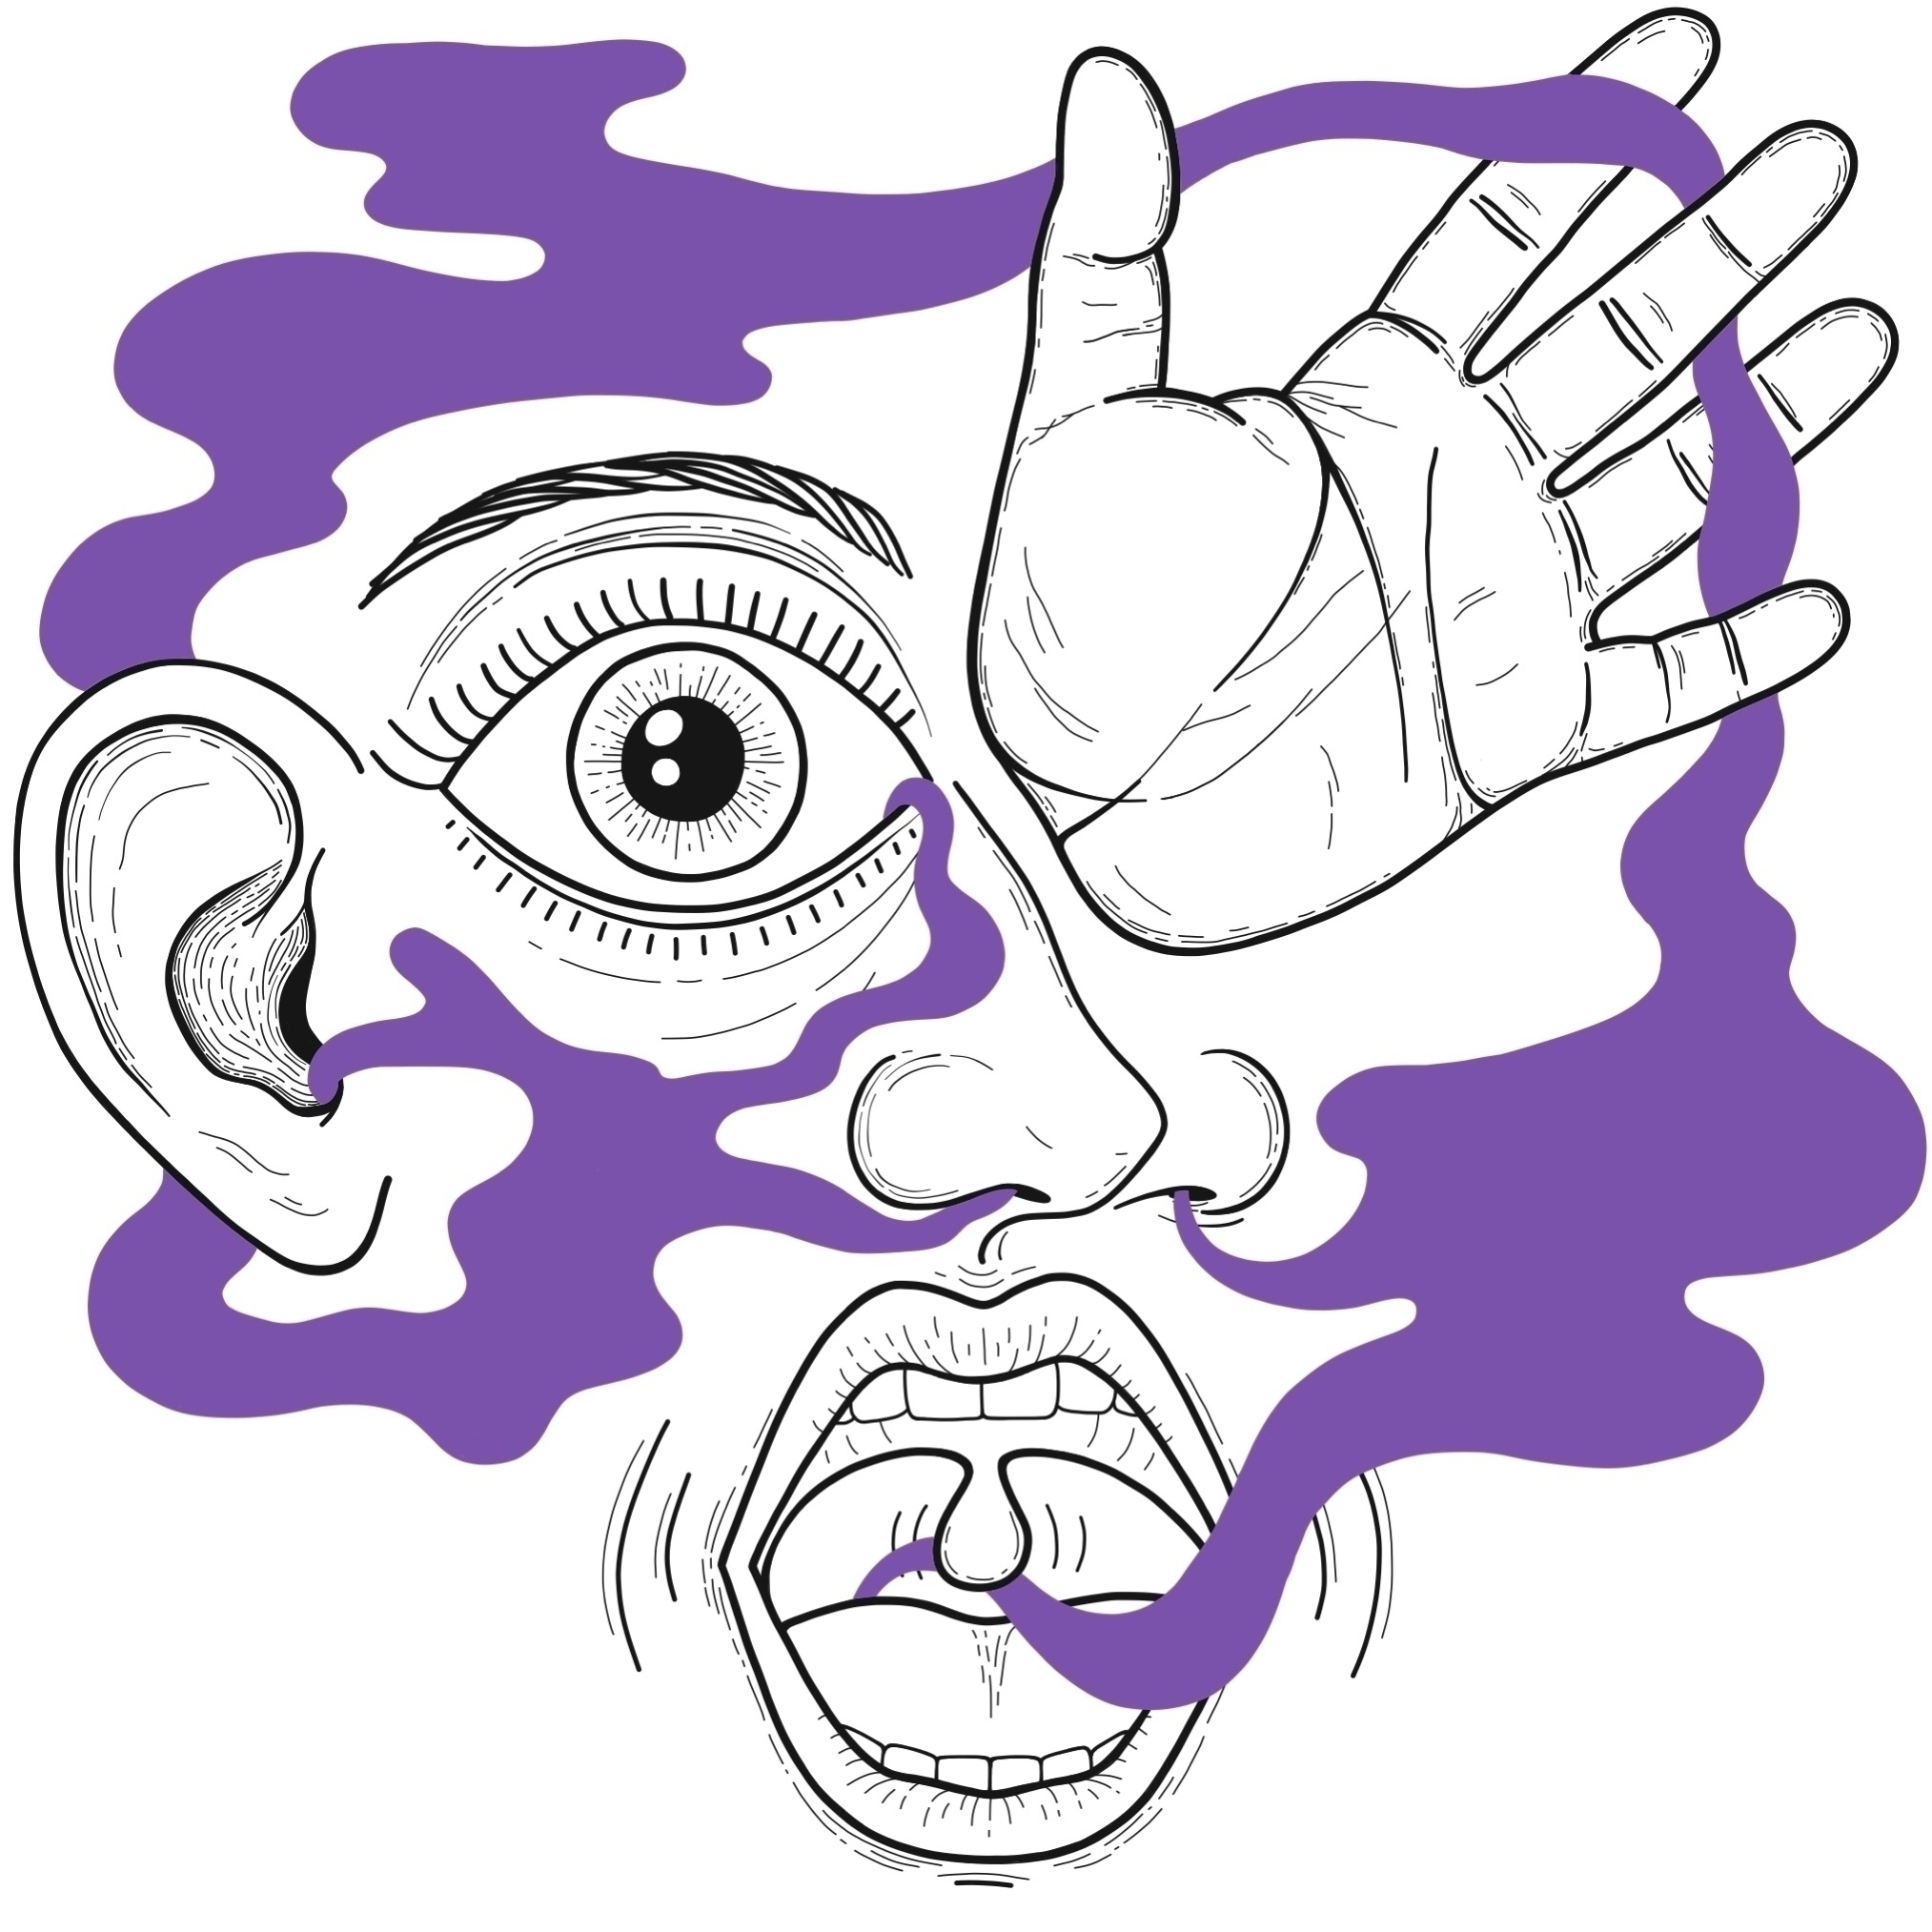 Sentidos - illustration, art, drawing - alicecquaglia | ello